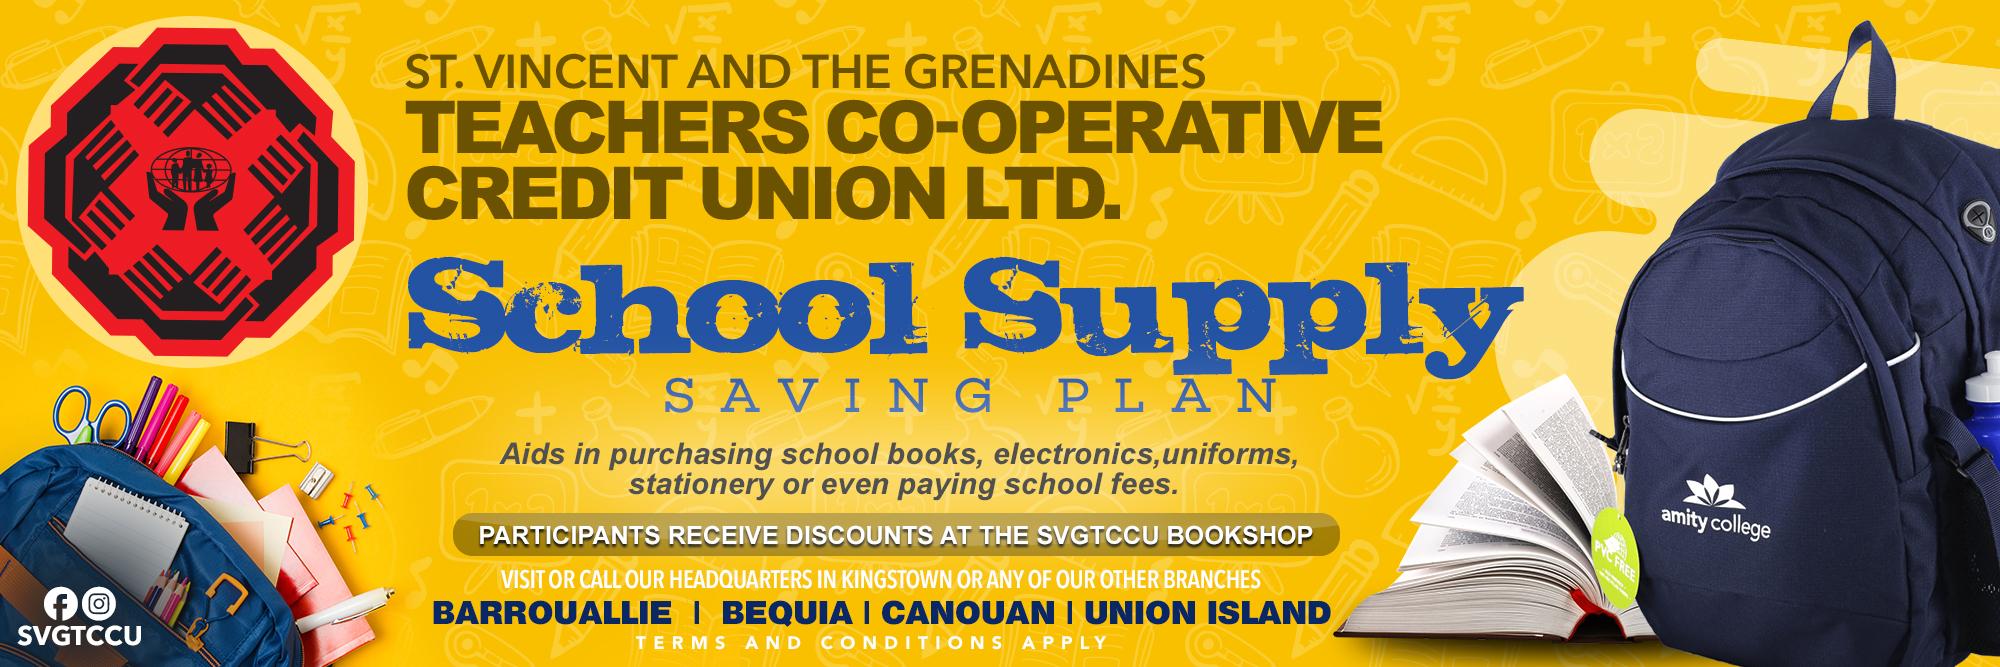 School Supply Saving Plan